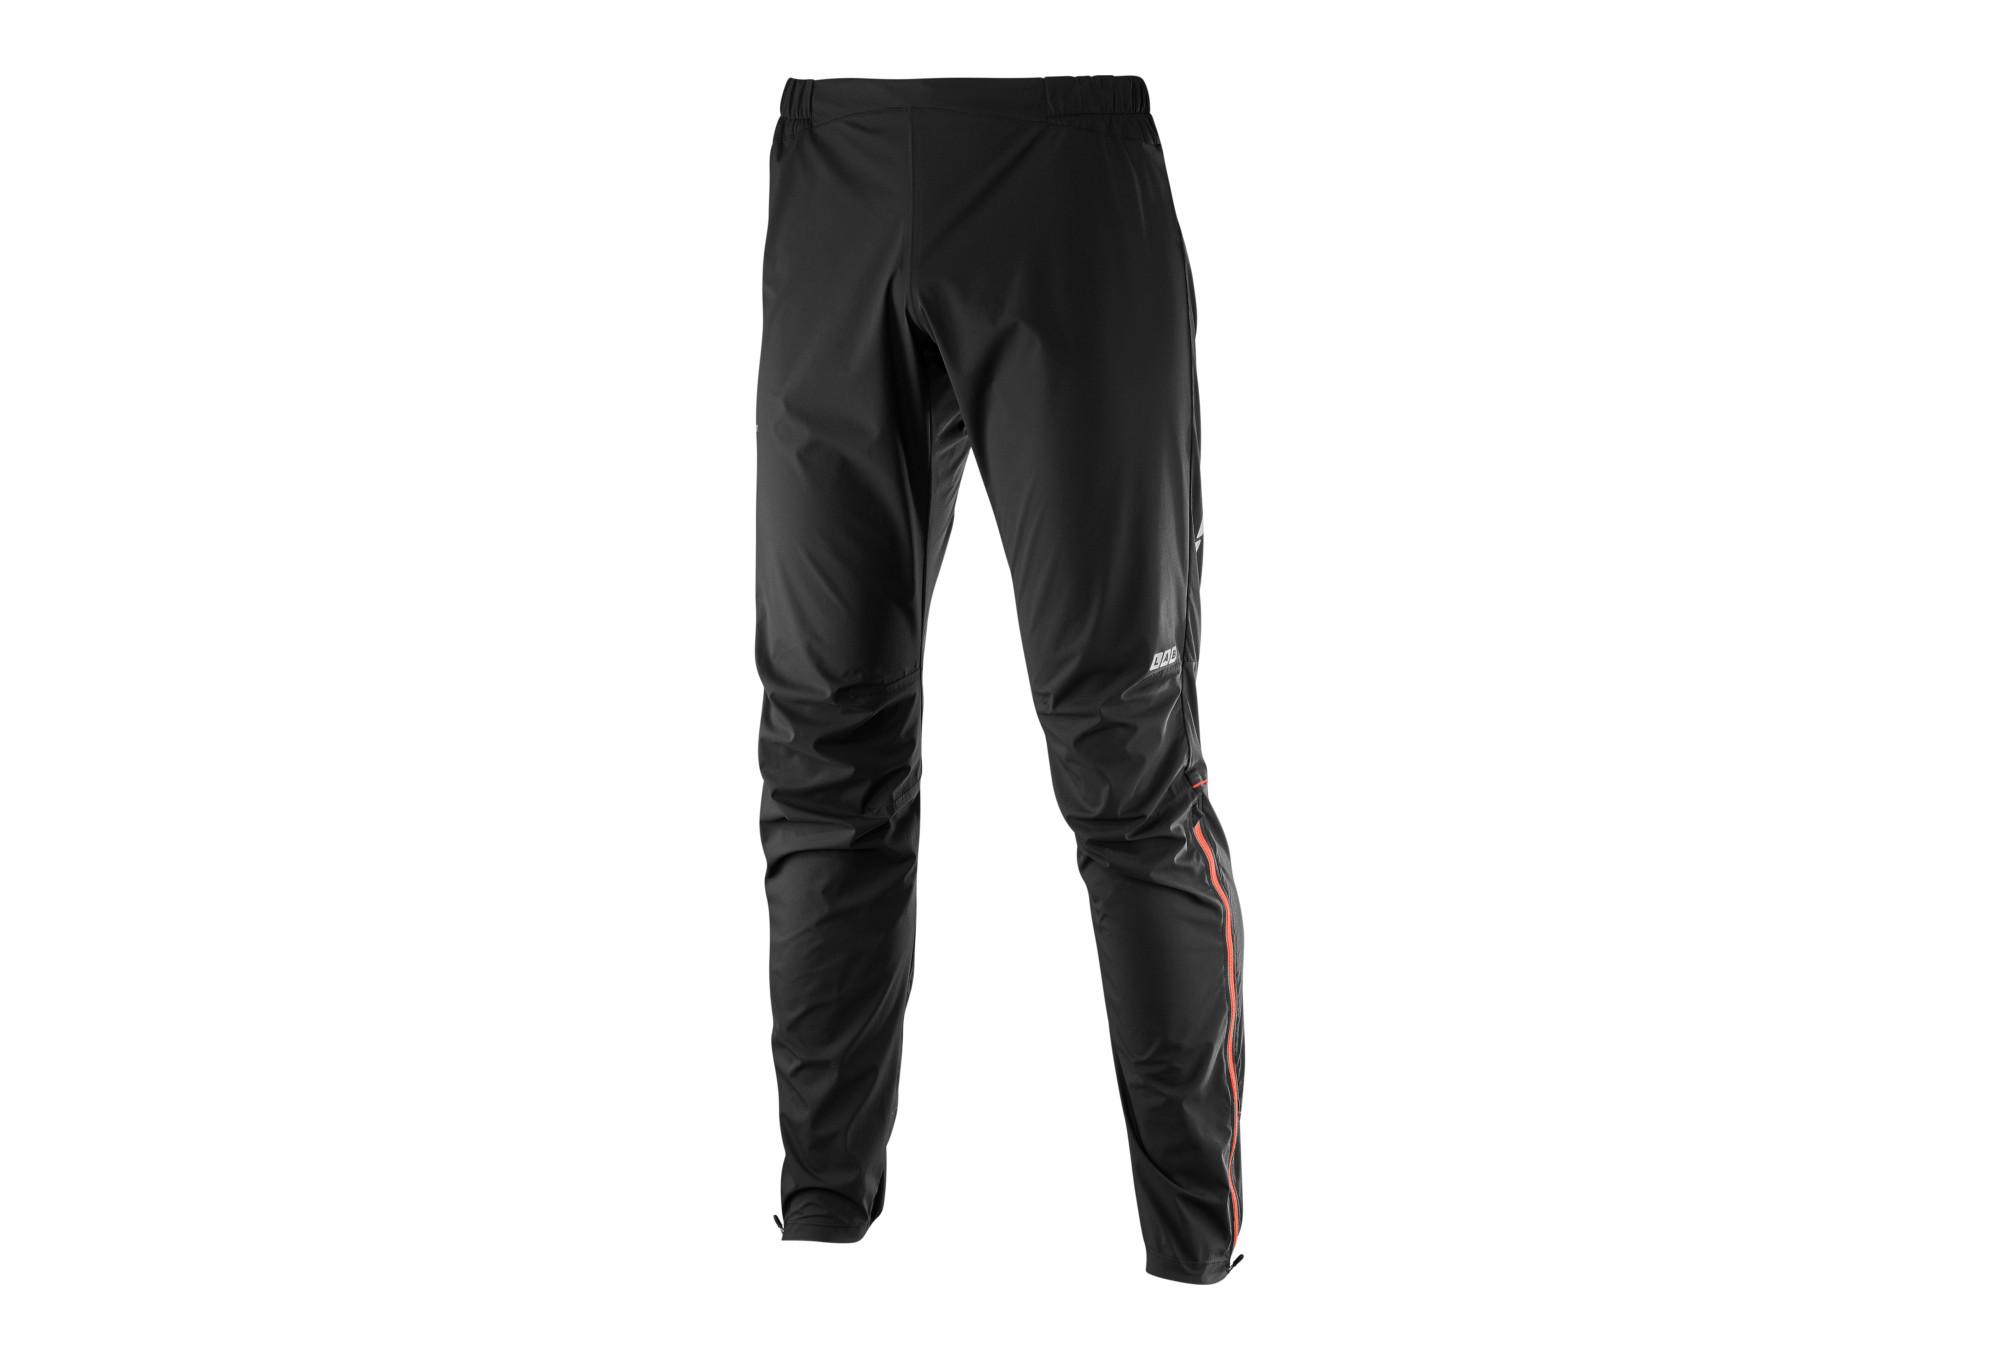 97c2dabaf87 Pantalon Running SALOMON S-LAB HYBRID Noir   Alltricks.fr